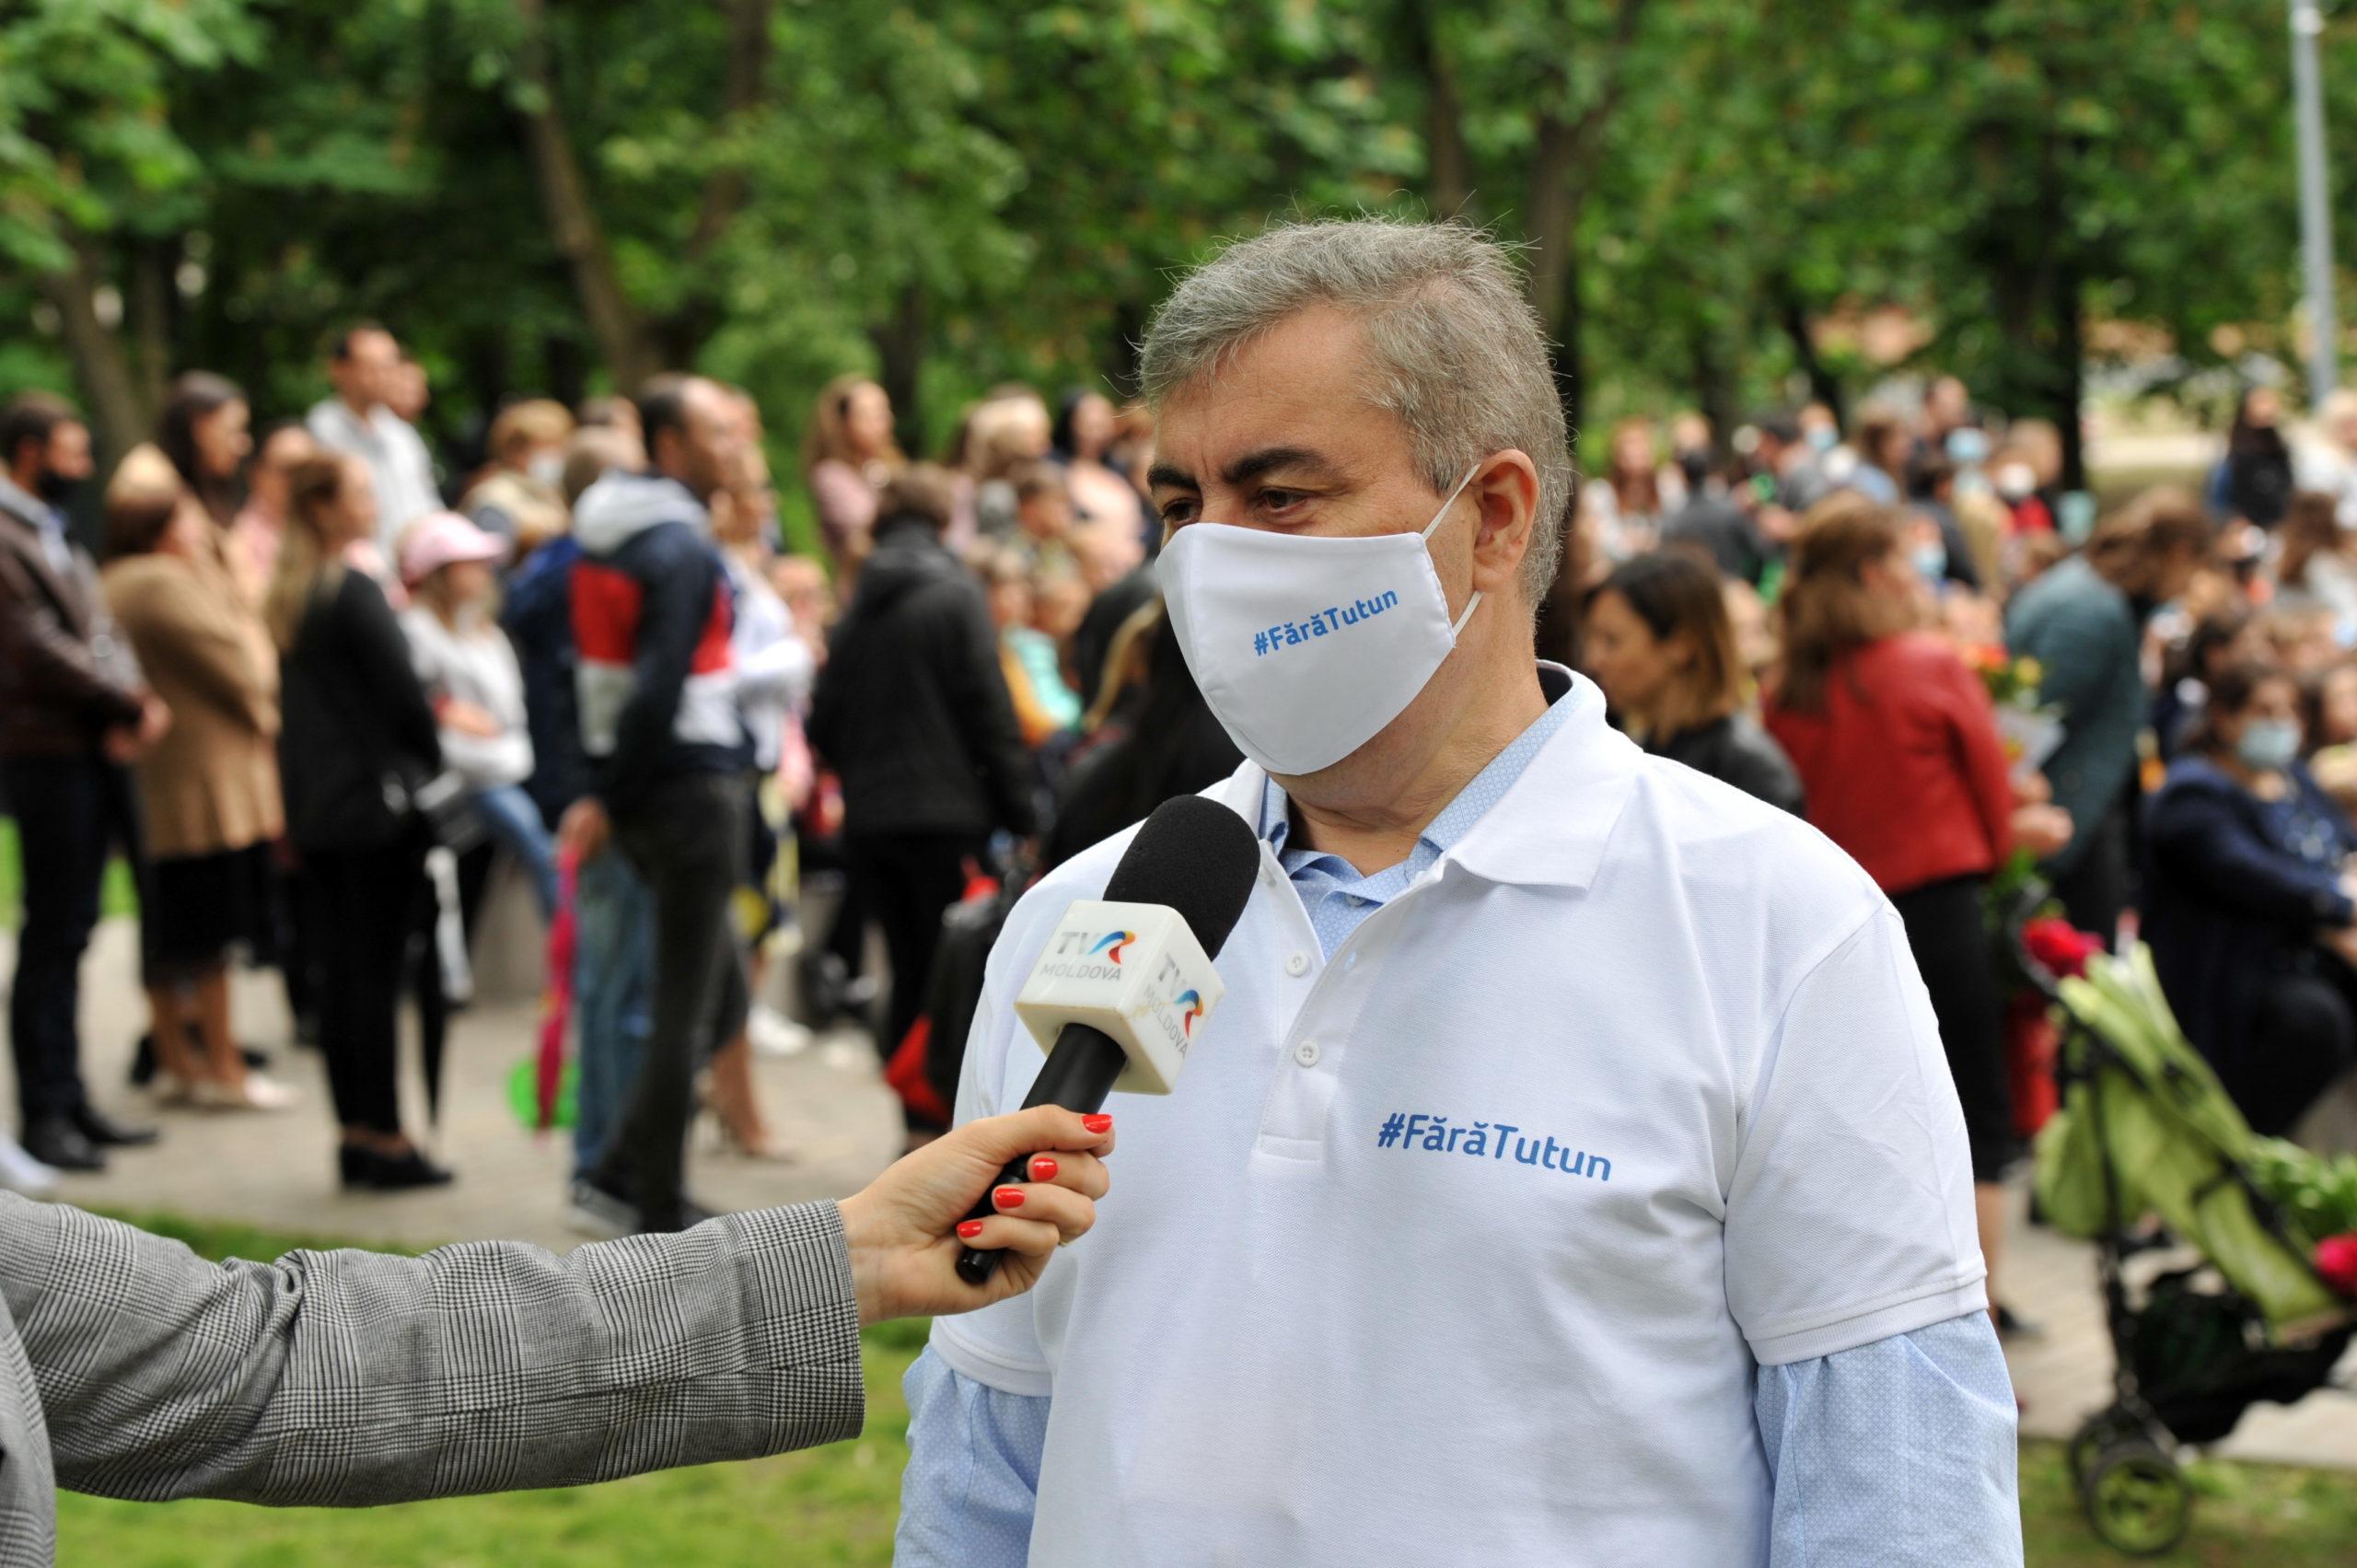 Впарке Alunelul прошла акция послучаю Всемирного дня без табака. Фоторепортаж NM